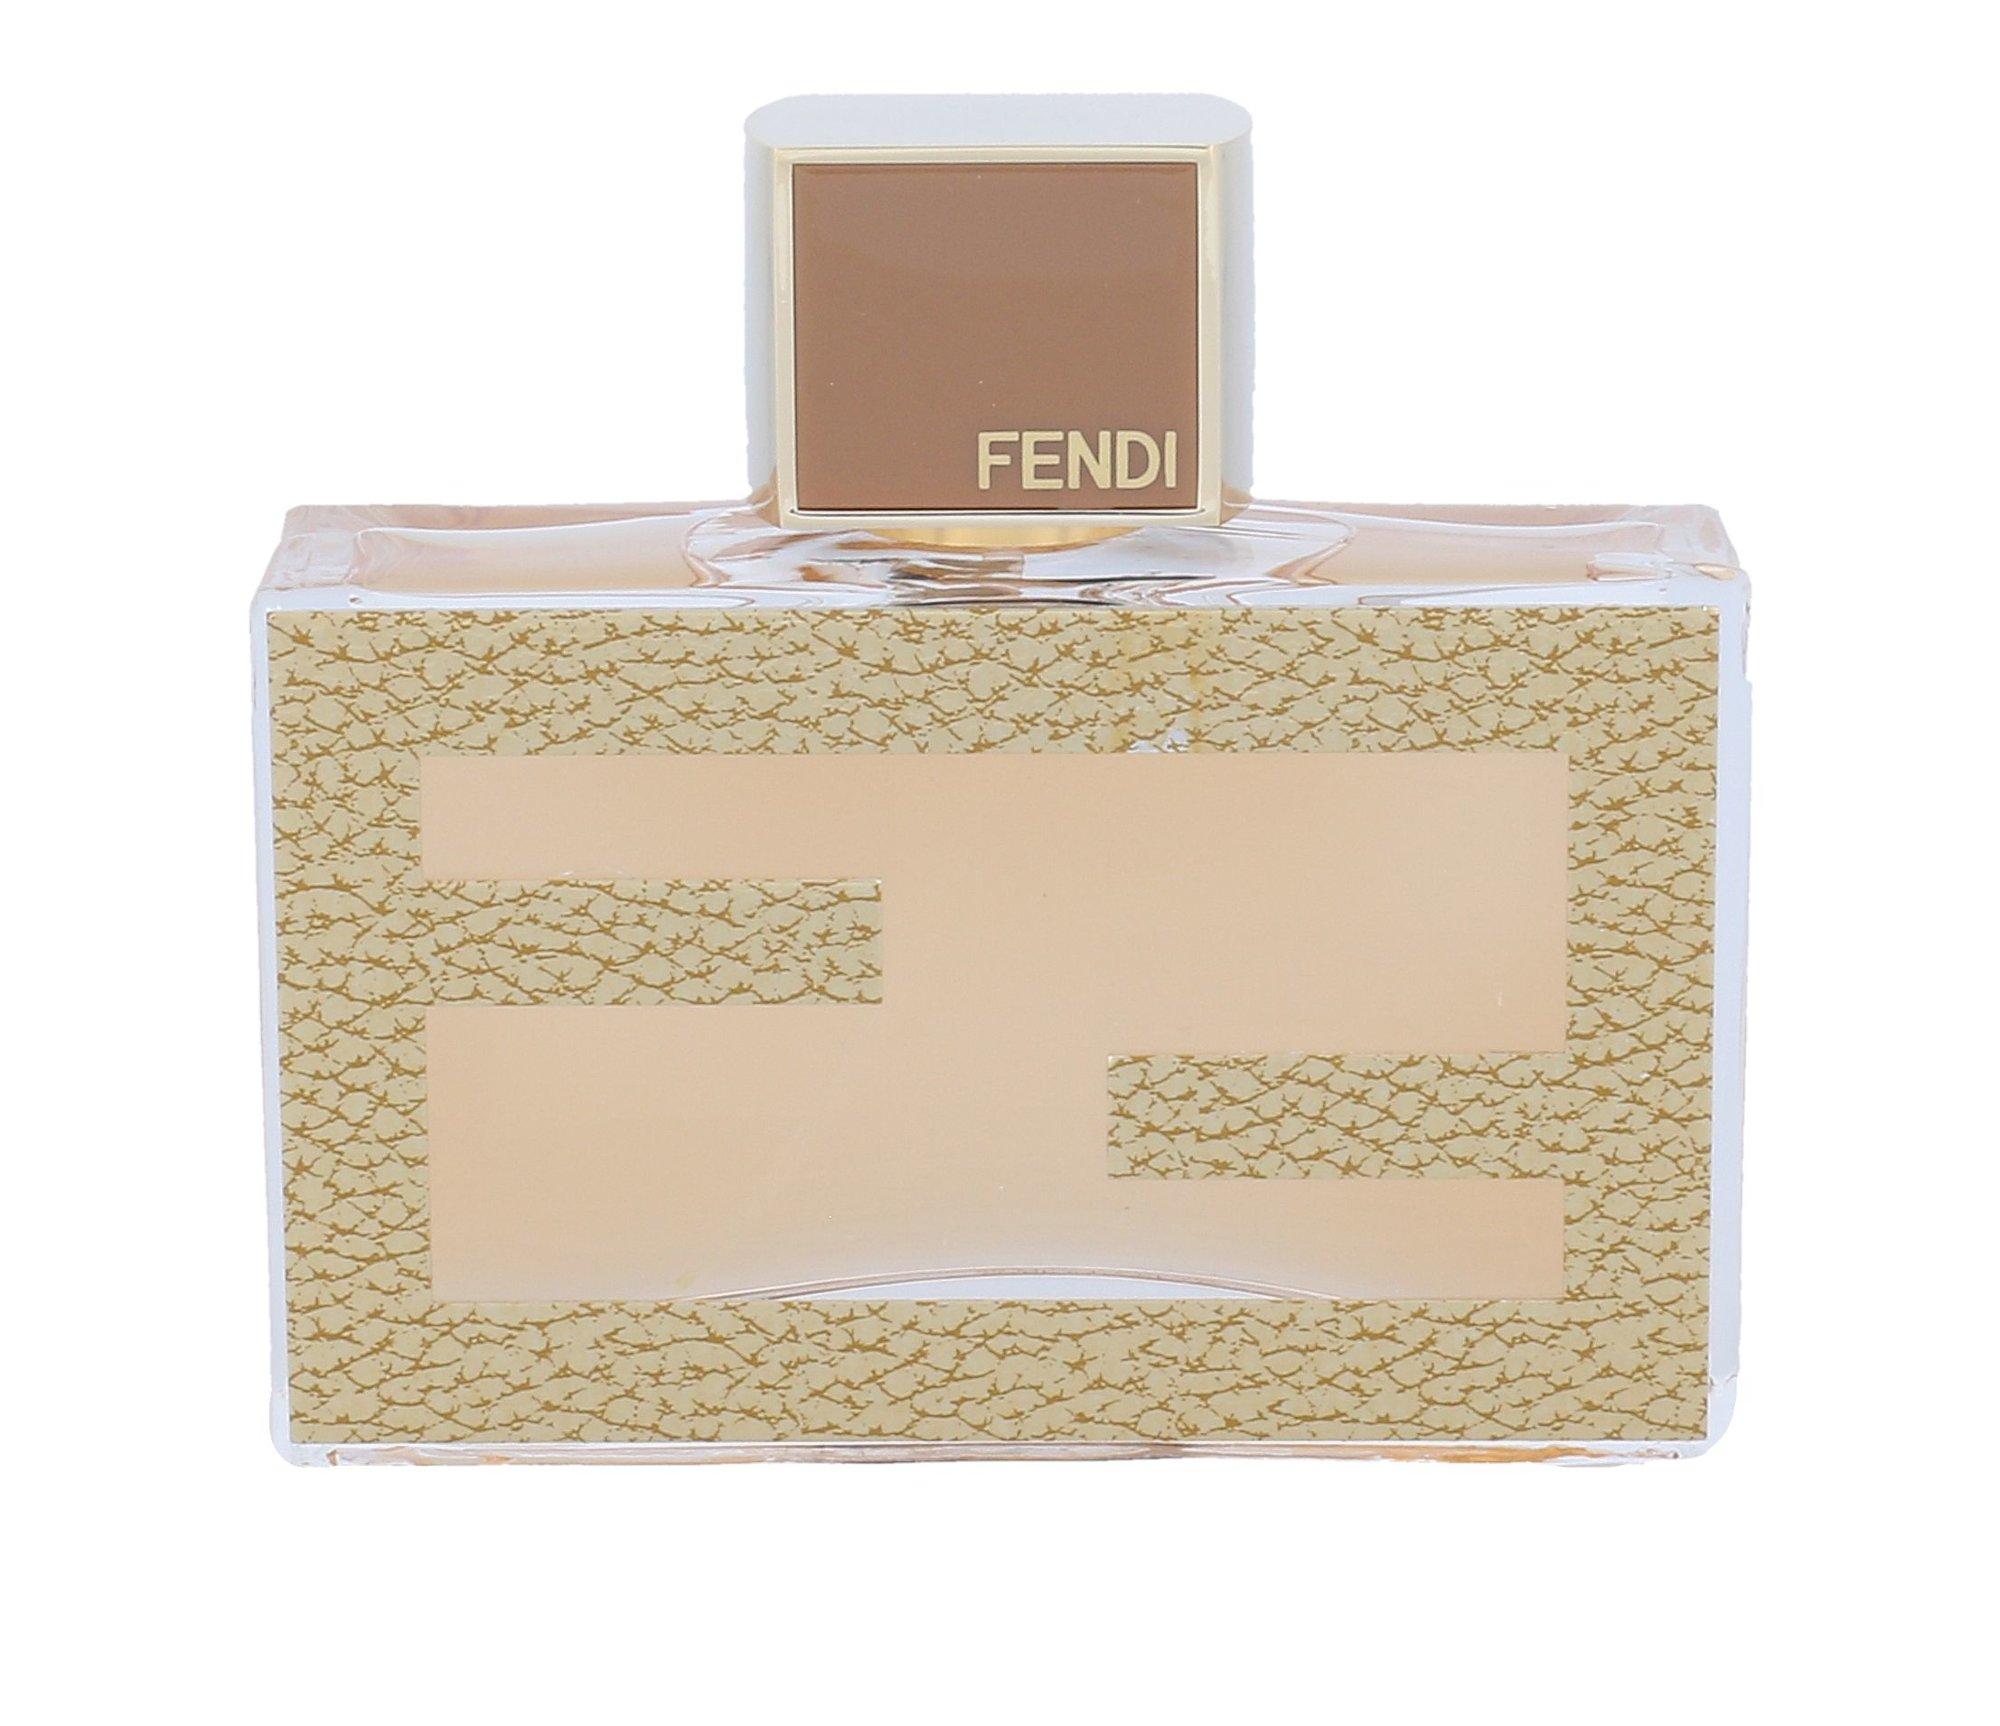 Fendi Fan di Fendi Leather Essence EDP 50ml